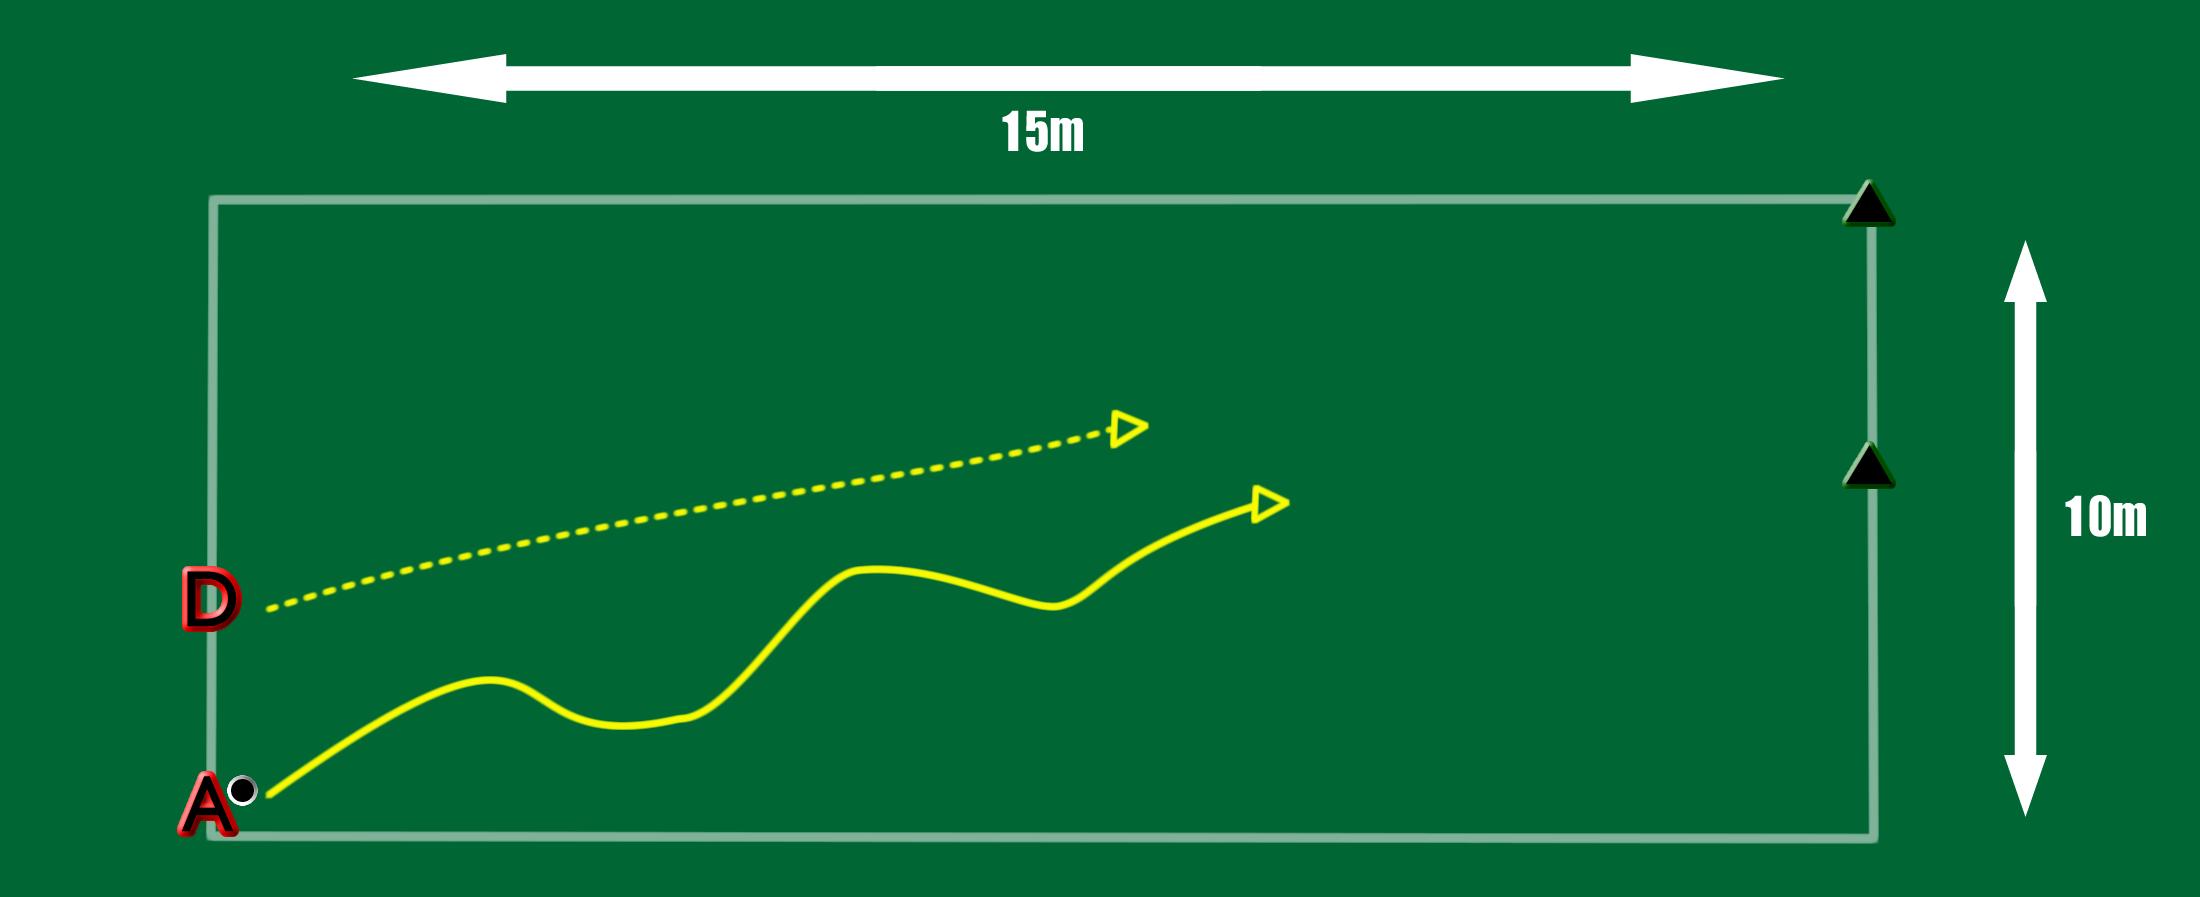 Funstix Lesson 7 Drills Field Hockey Canada Schematic Diagram2 Channels Same As Below Side By Diagram 1